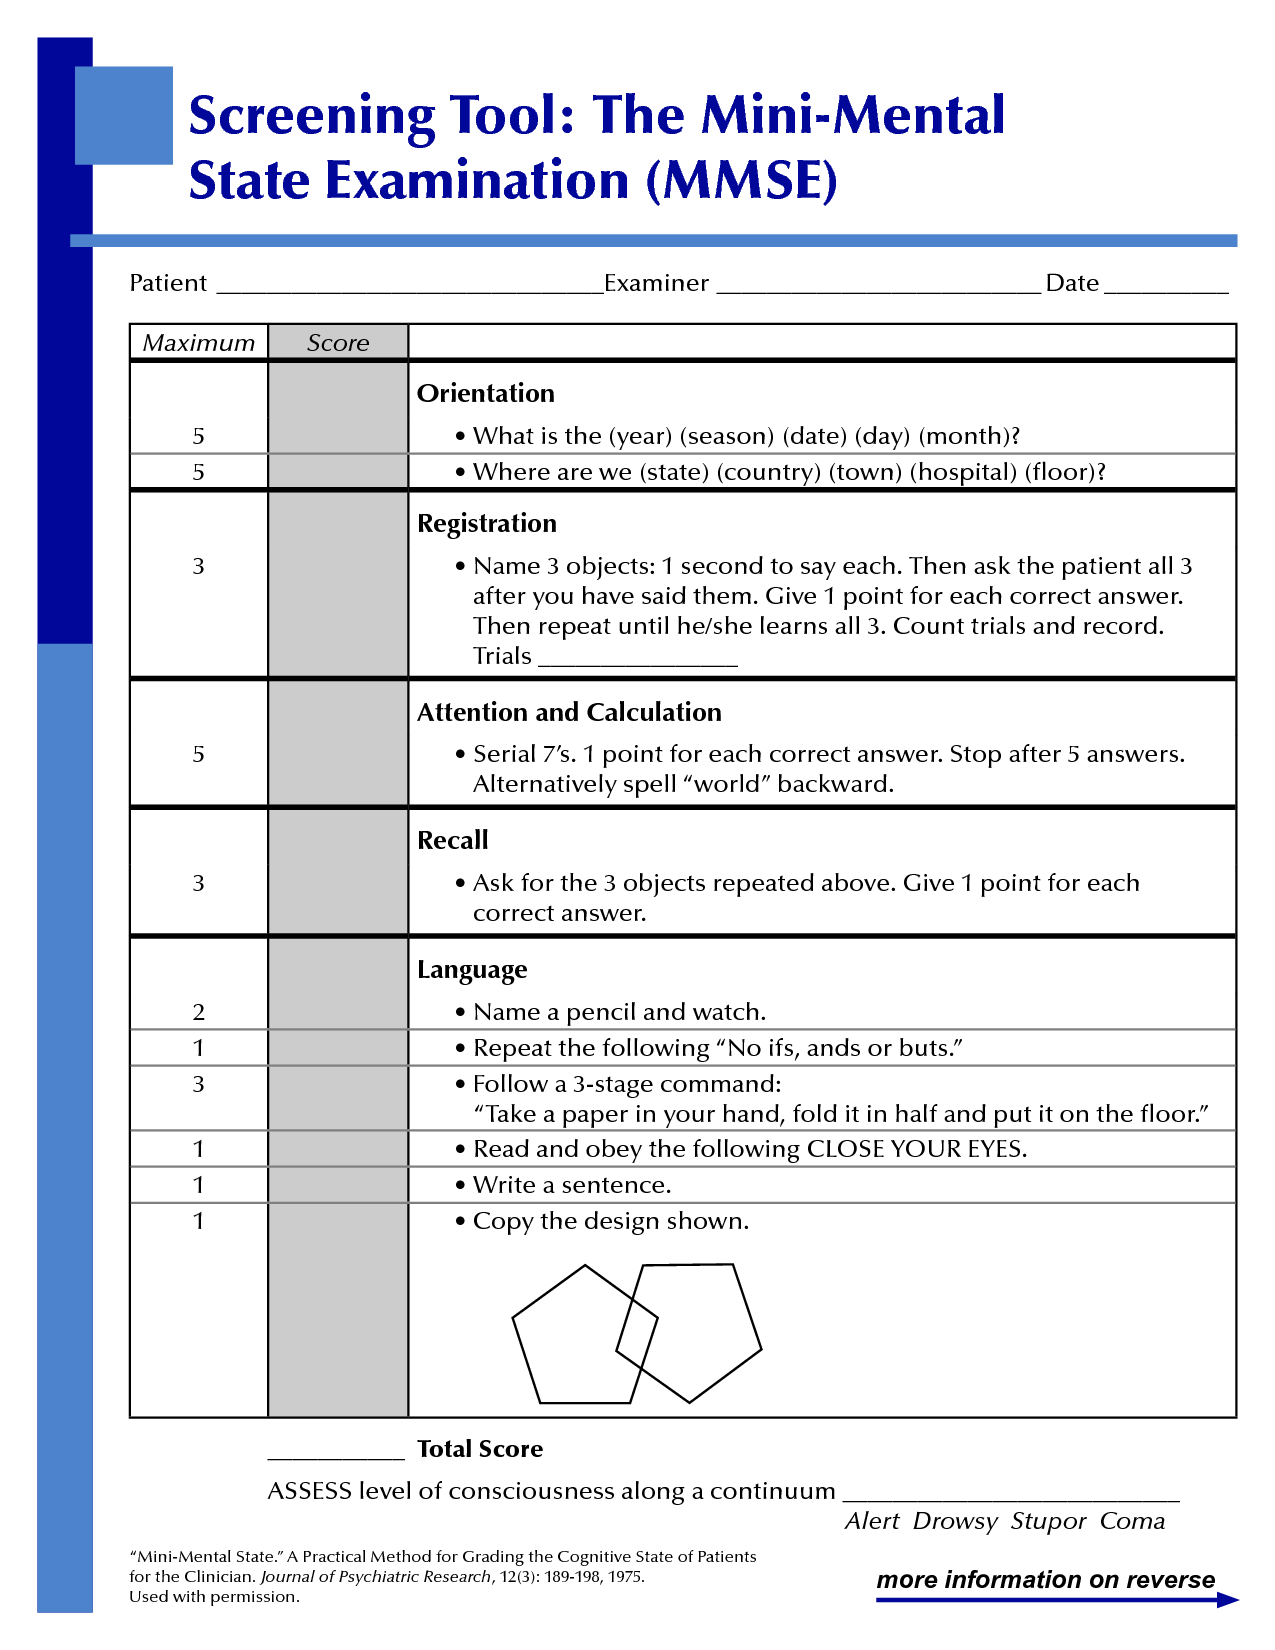 Folstein Mini Mental Status Exam